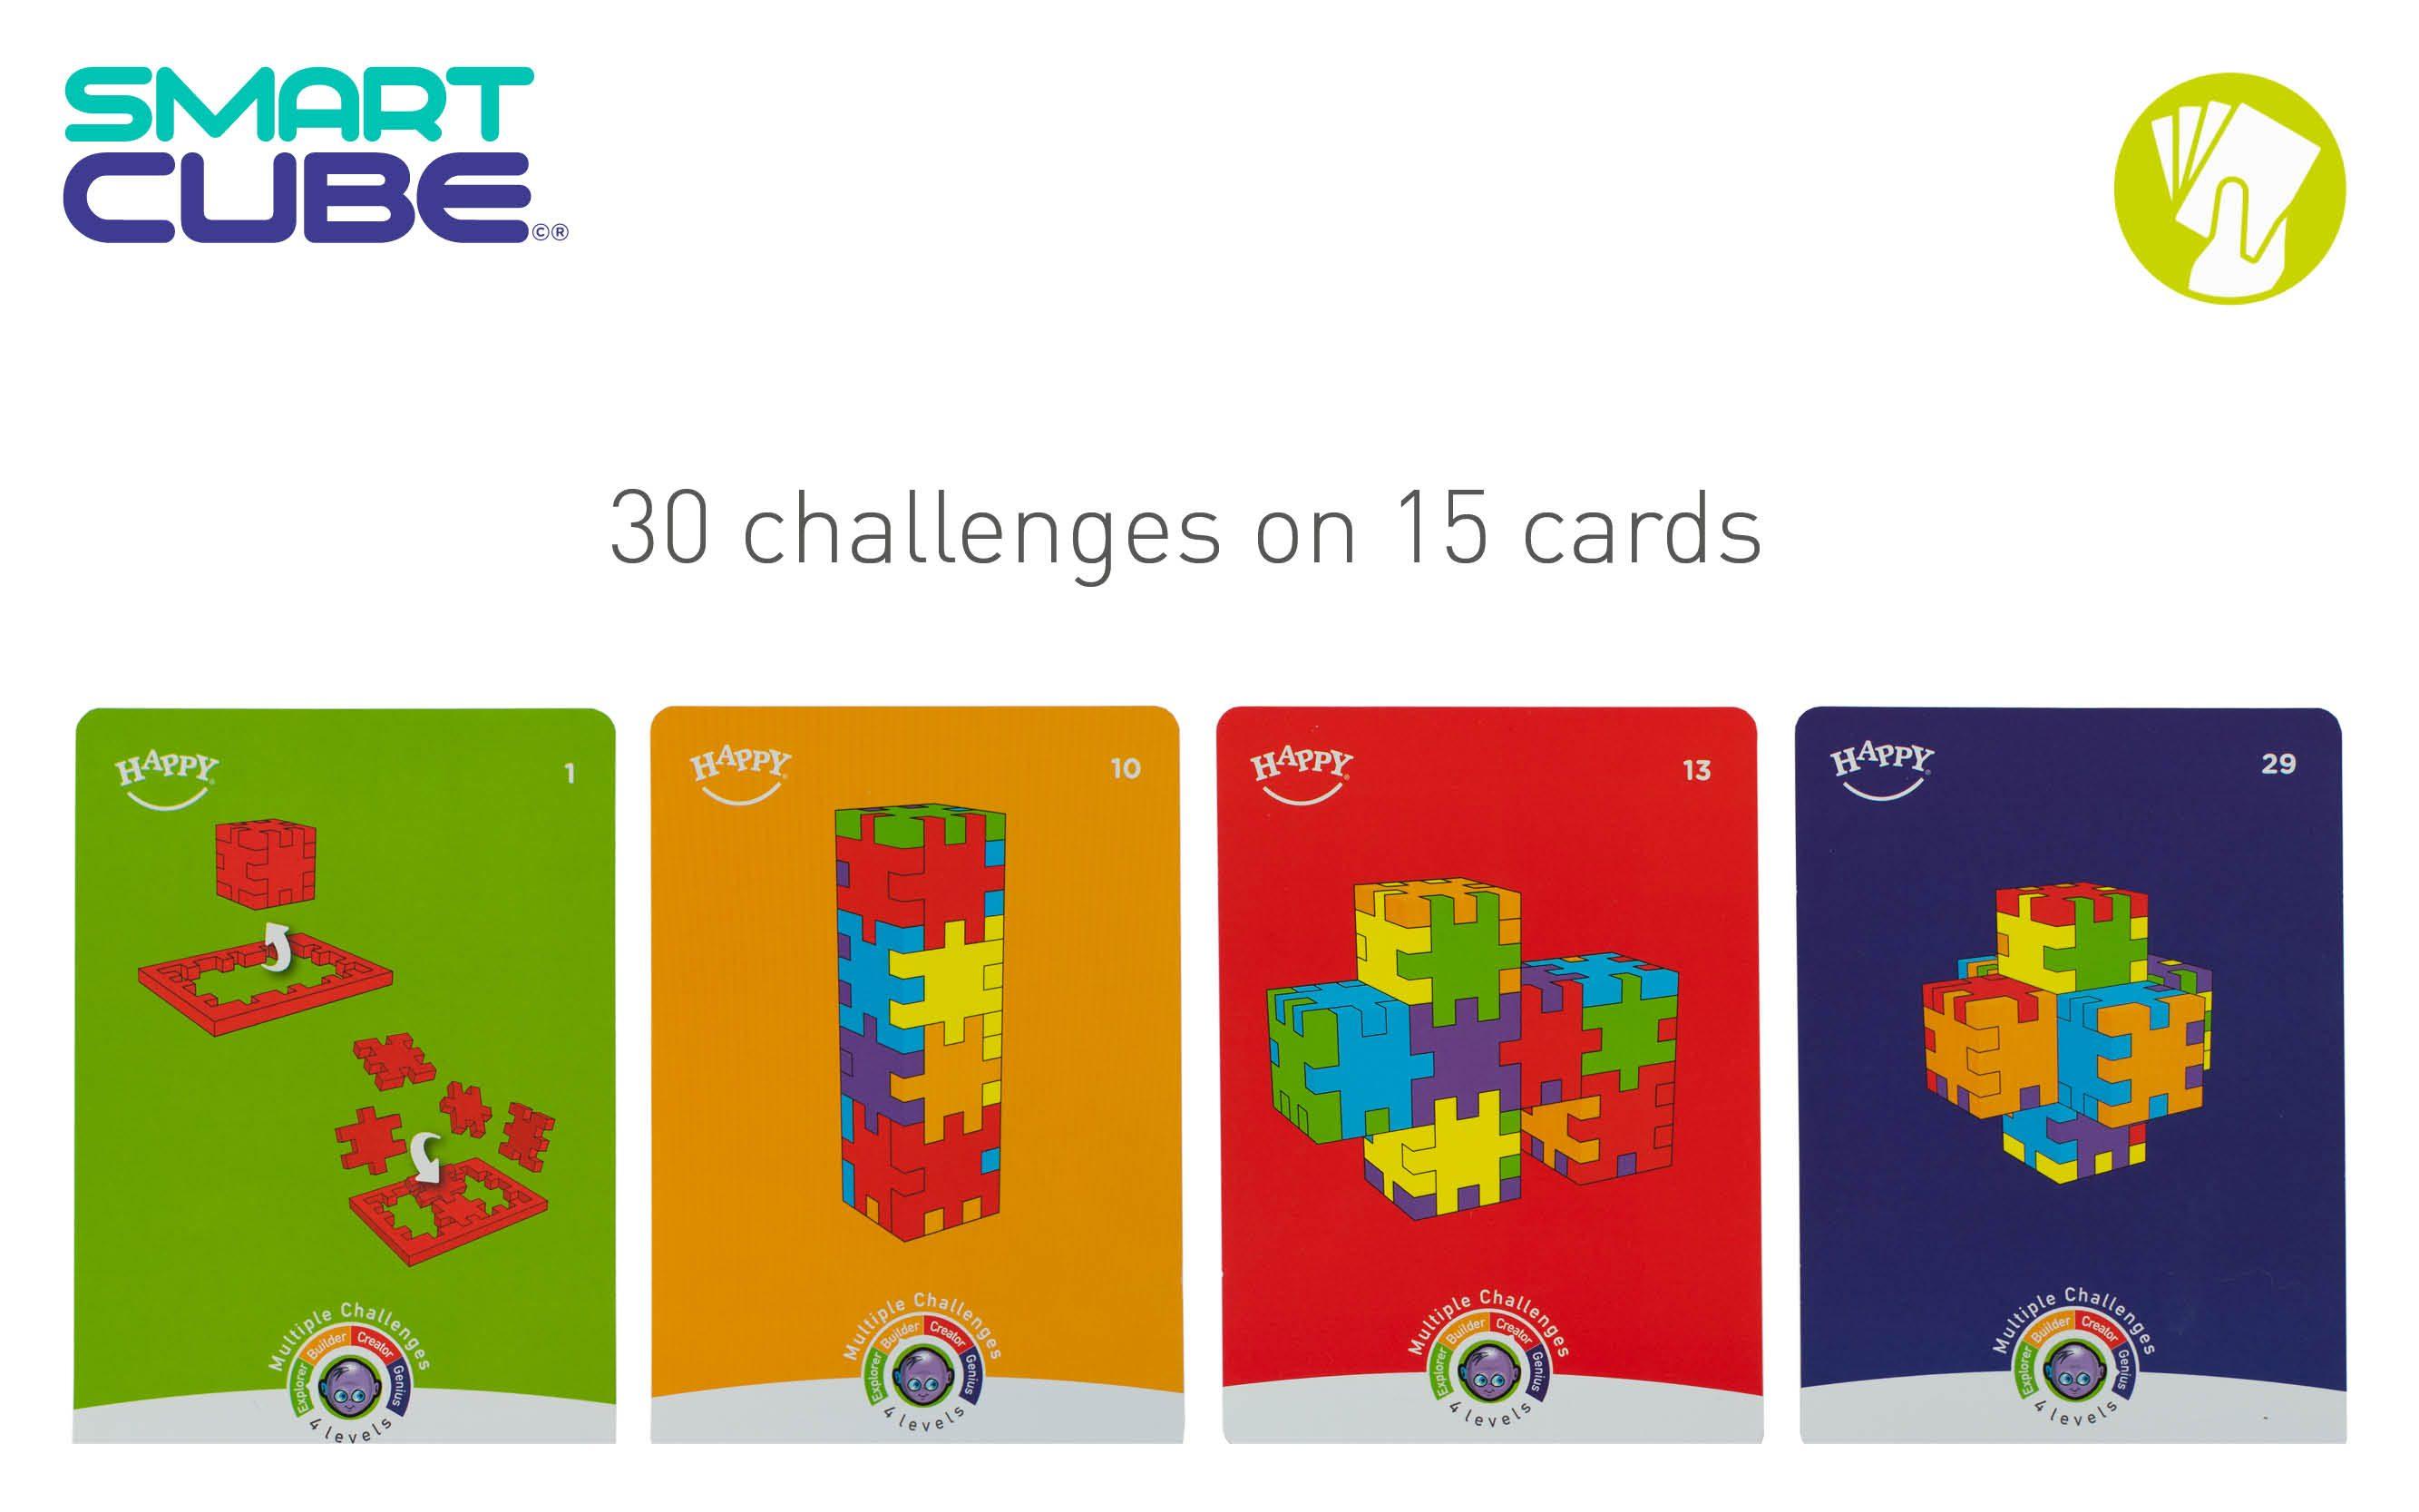 Happy_Smart_Cube_6-pack-cards-foampuzzles-preschool